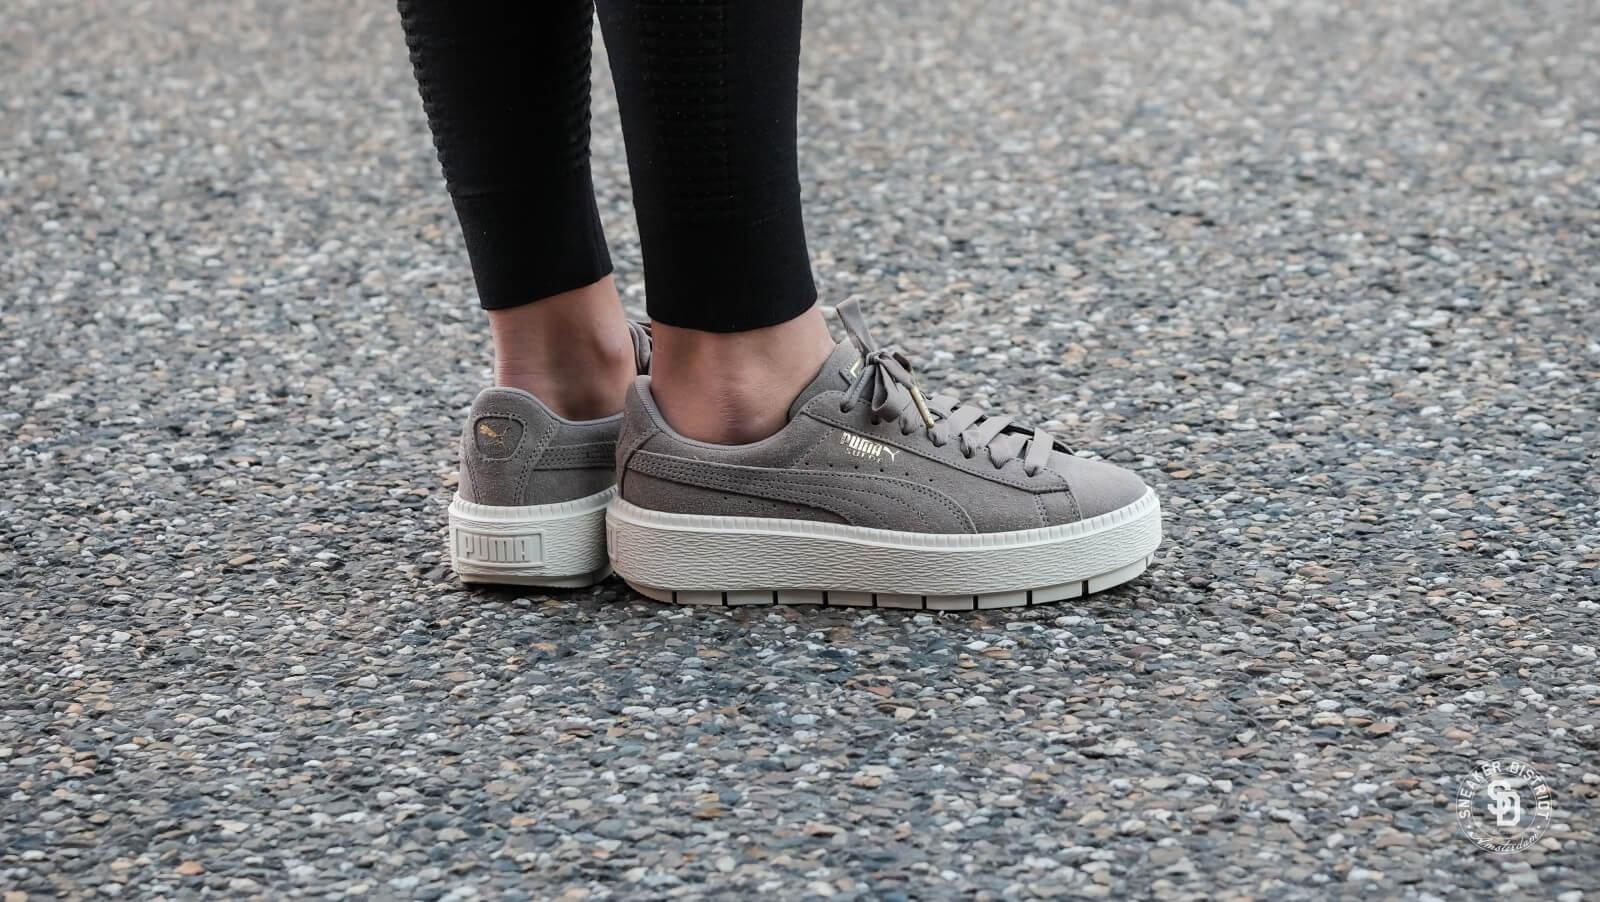 puma rock ridge suede platform sneakers